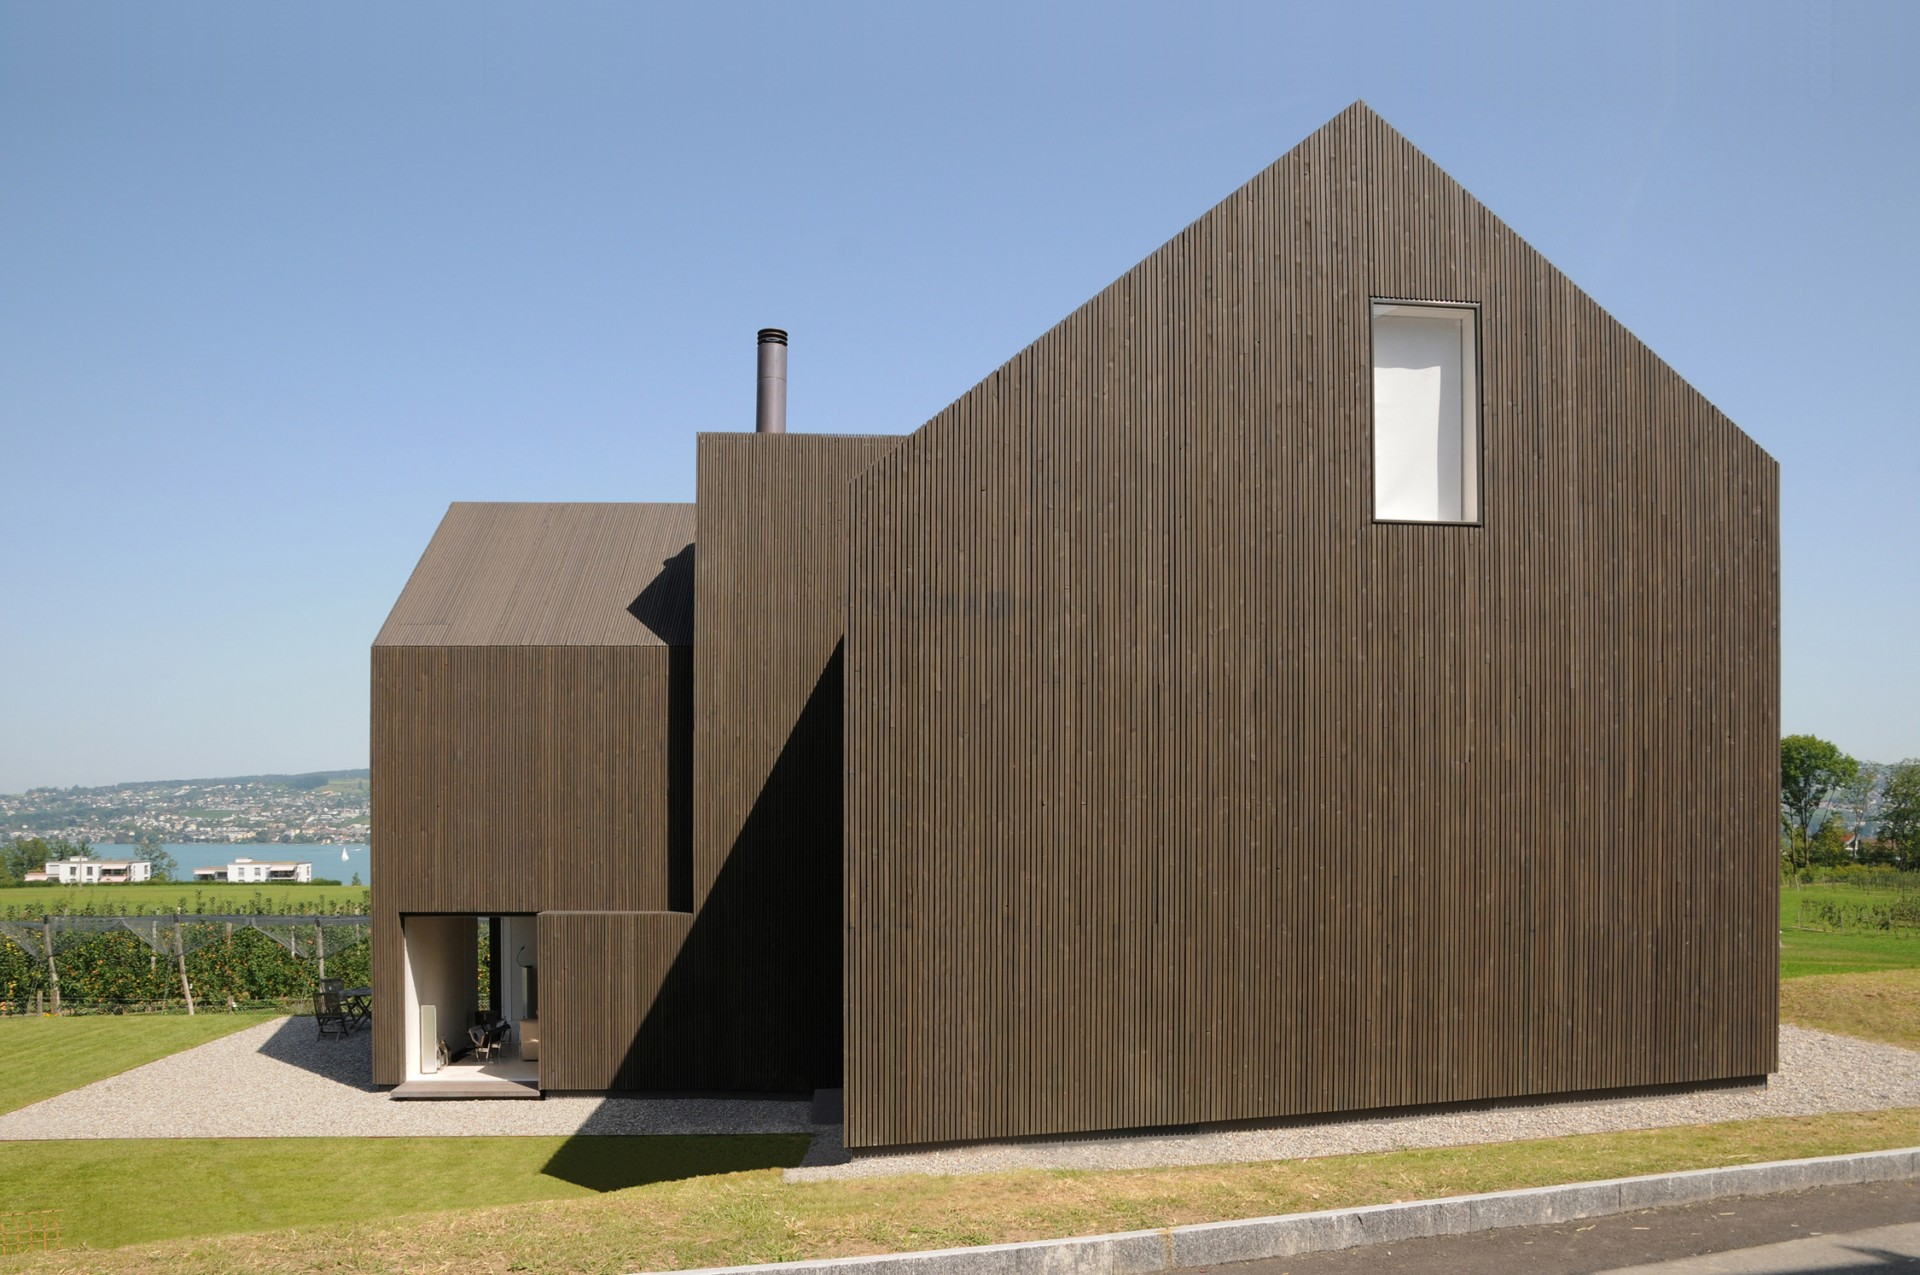 rossetti wyss architekten fingerprints exhibition in paris floornature. Black Bedroom Furniture Sets. Home Design Ideas